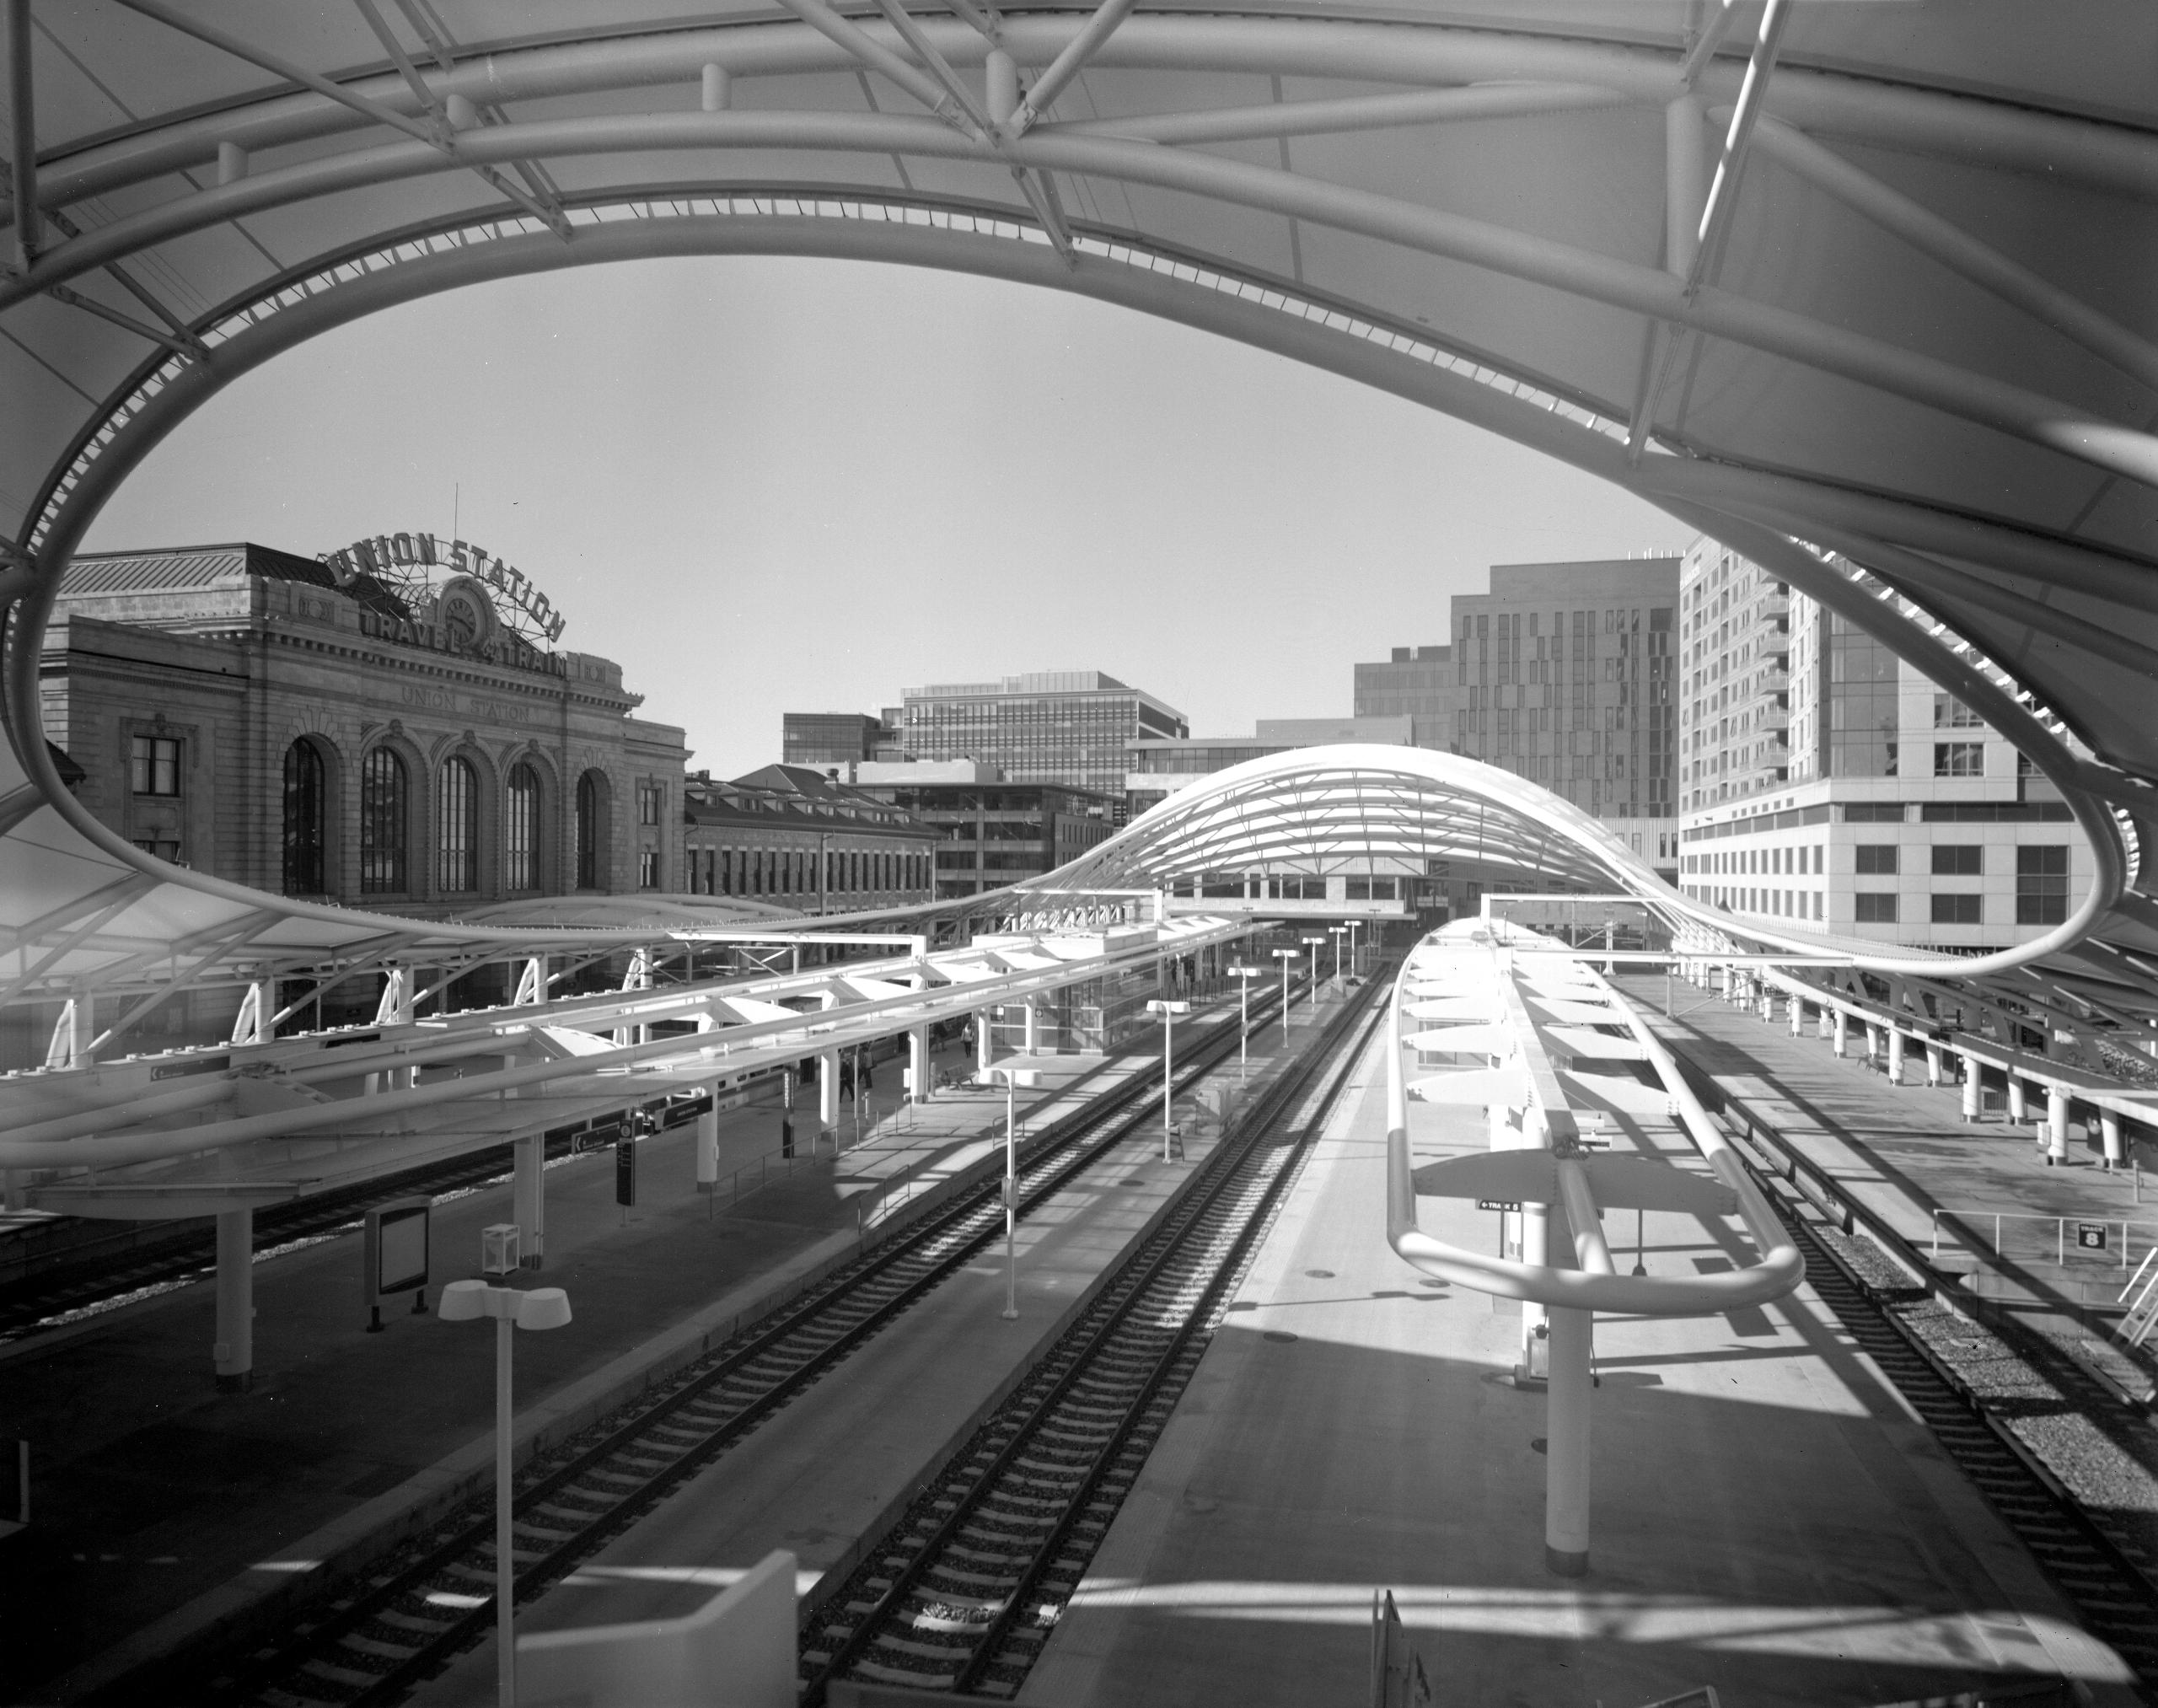 Denver Union Station - Sunday M - benmesander | ello